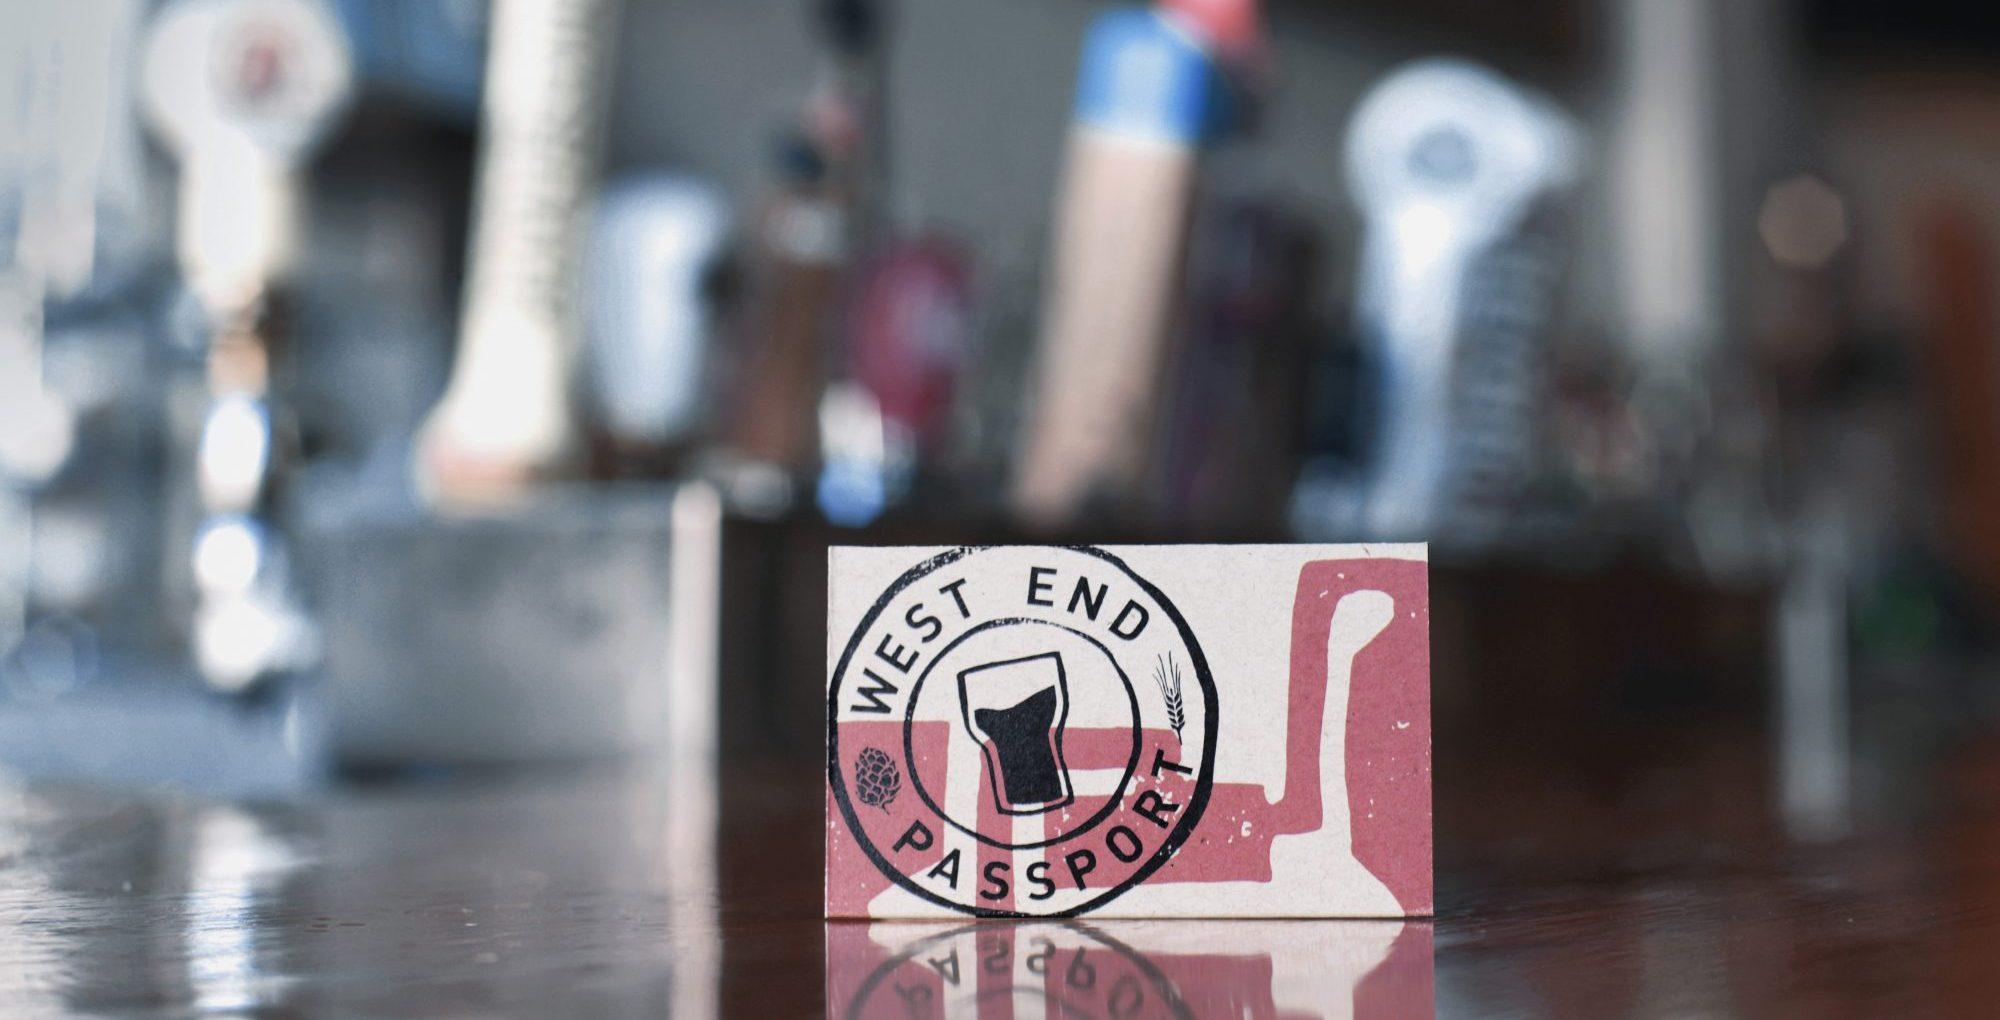 Toronto's Craft Beer Passport hops into its third year